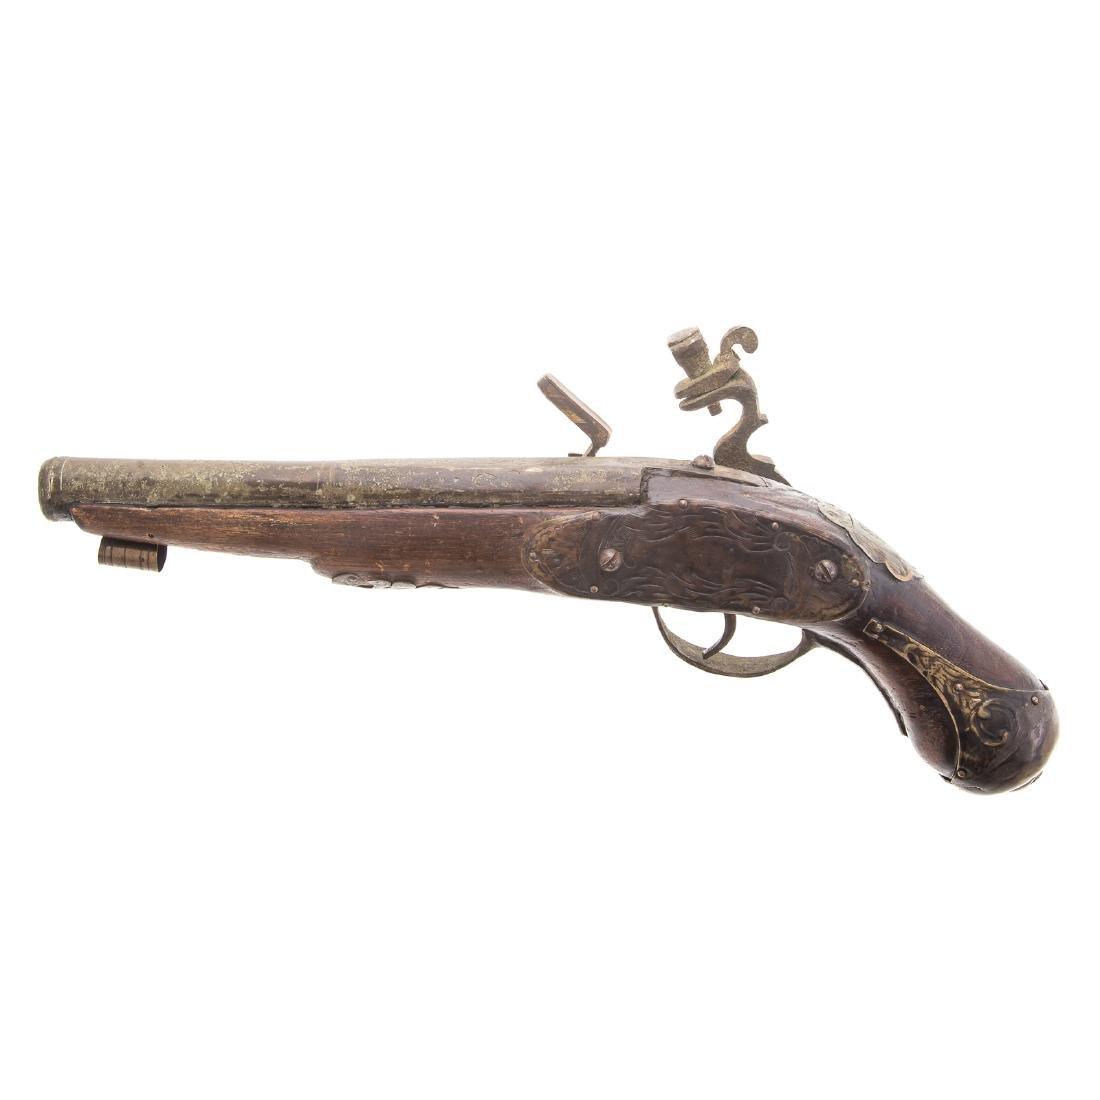 1700s Flintlock pistol - 4